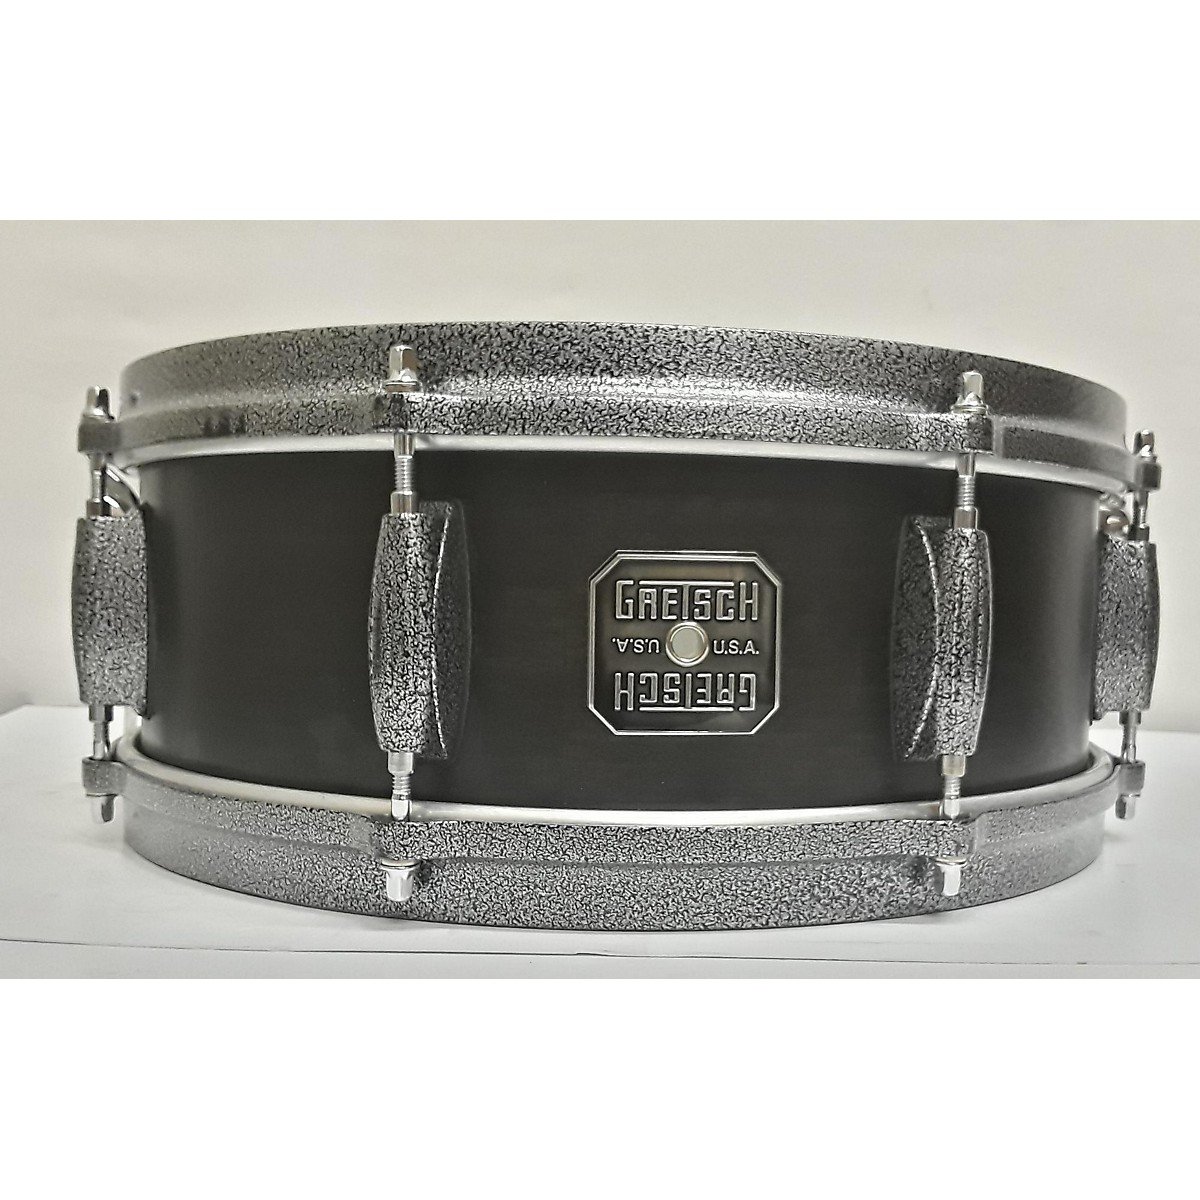 Gretsch Drums 2000s 5.5X14 Harvey Mason Signature Snare Drum